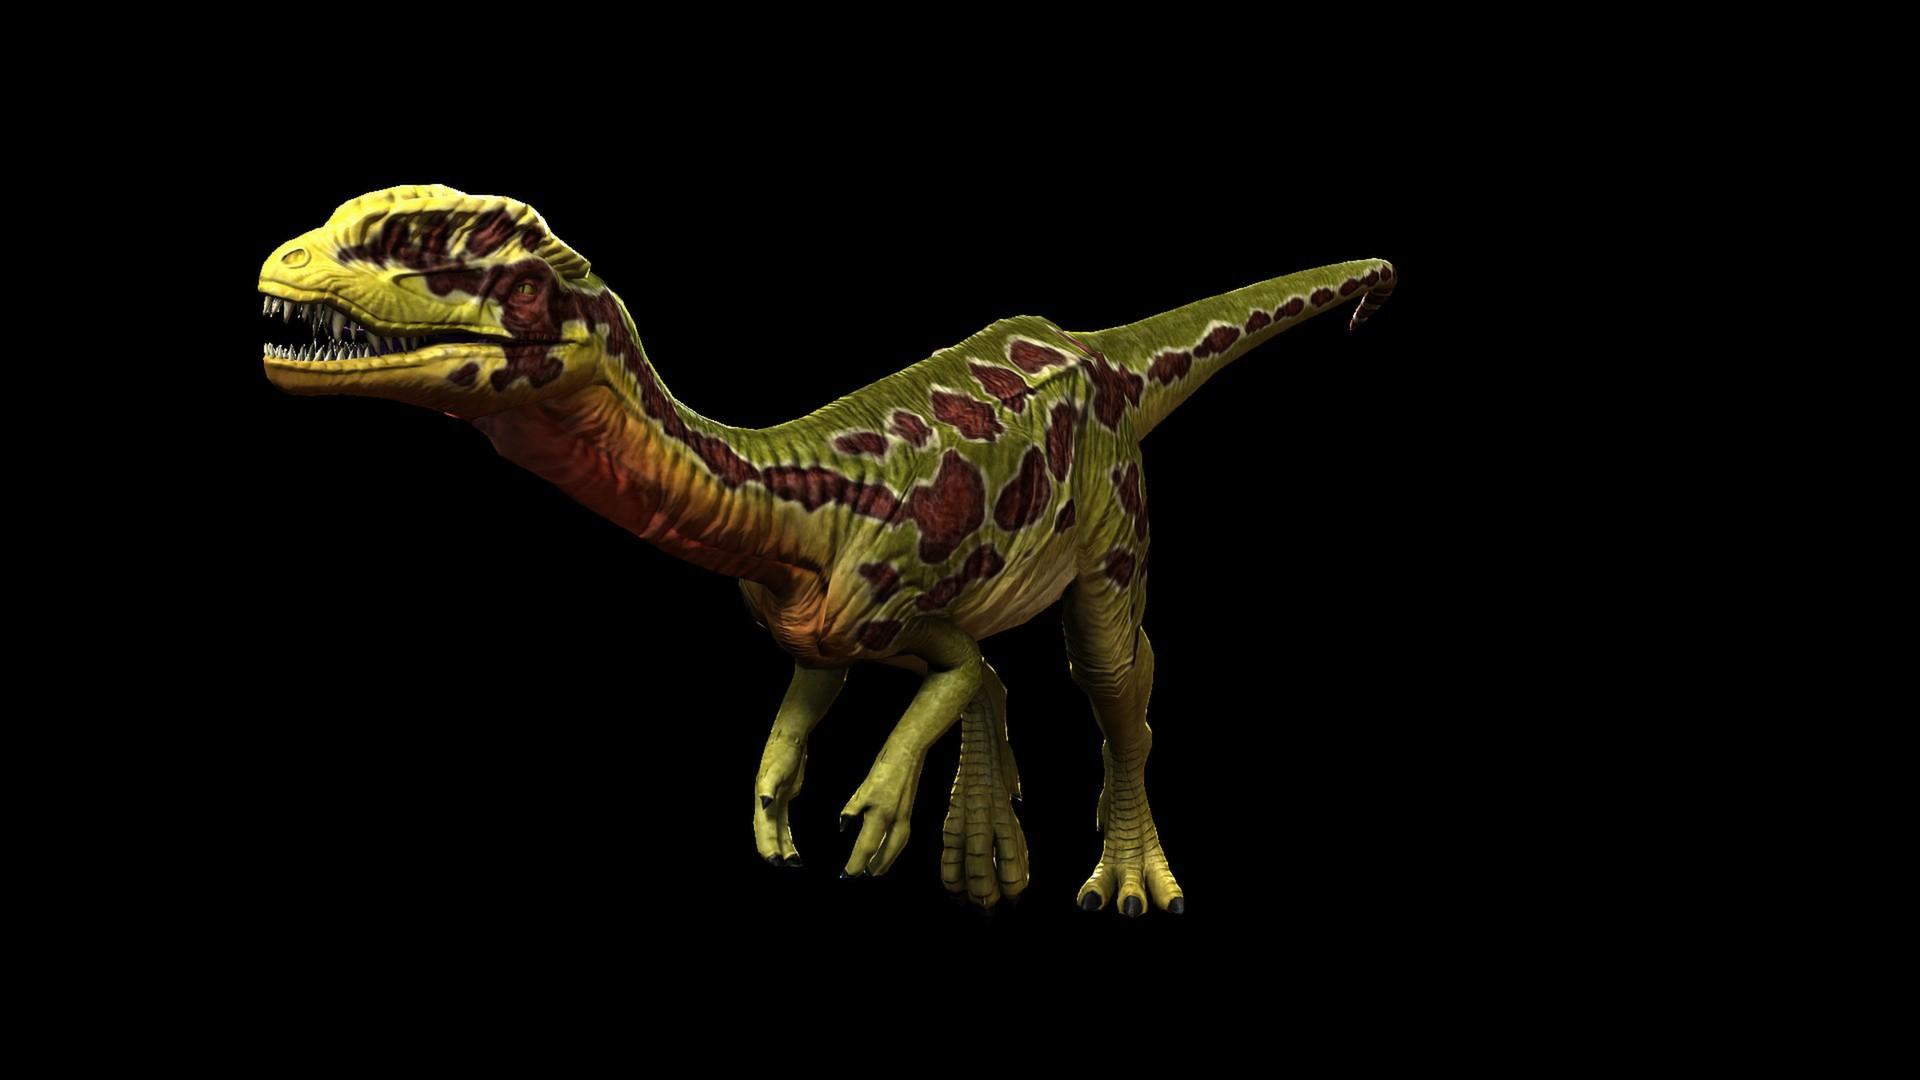 dilophosaurus primal carnage - photo #13